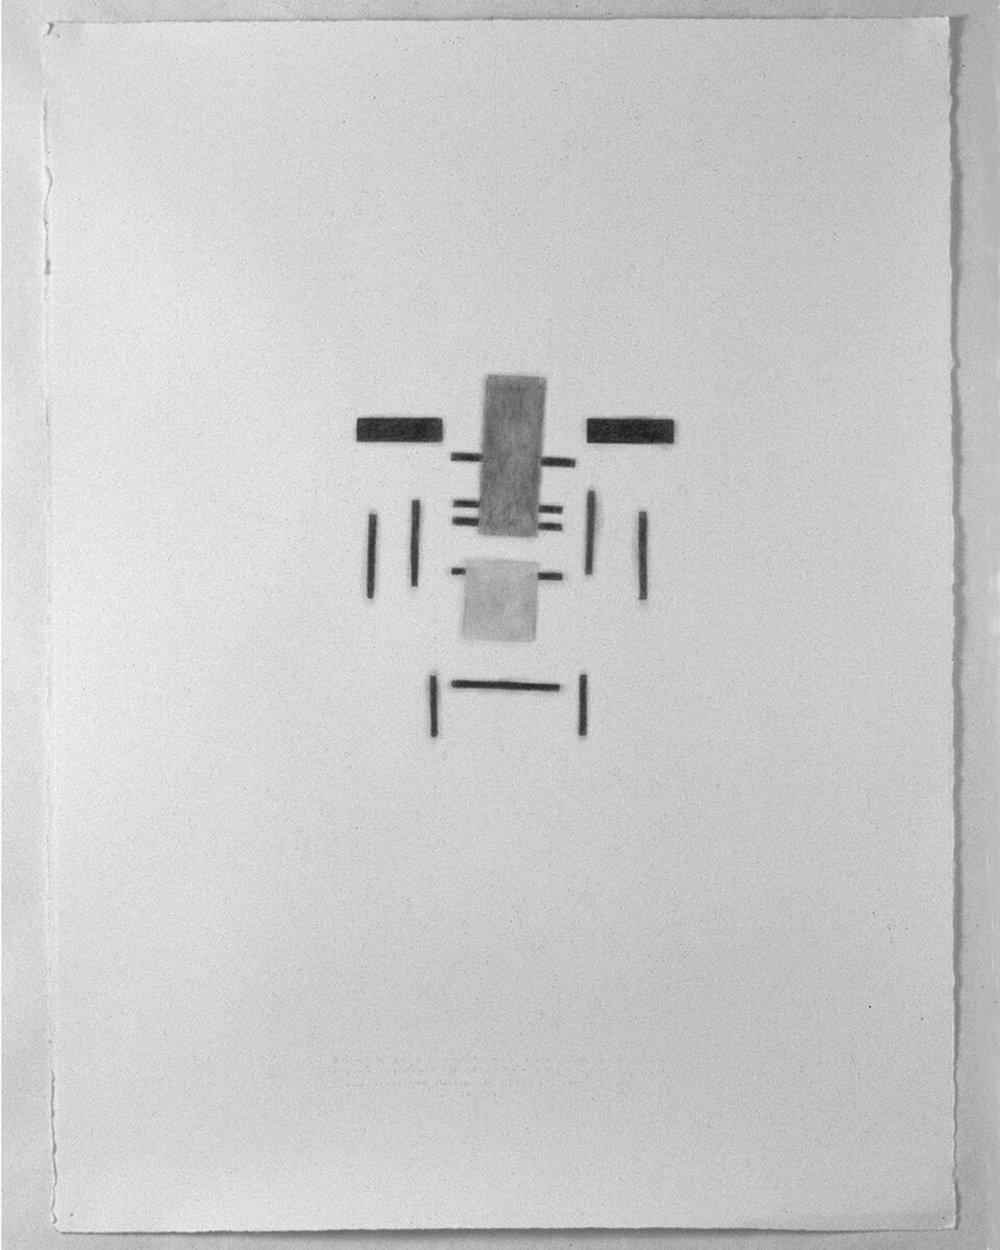 """Blauprint van Rietveld's stoel '…den stuhl sich flochte.""  (Blueprint of Rietveld's Chair), 1997  30""x 22"", graphite pencil on paper"